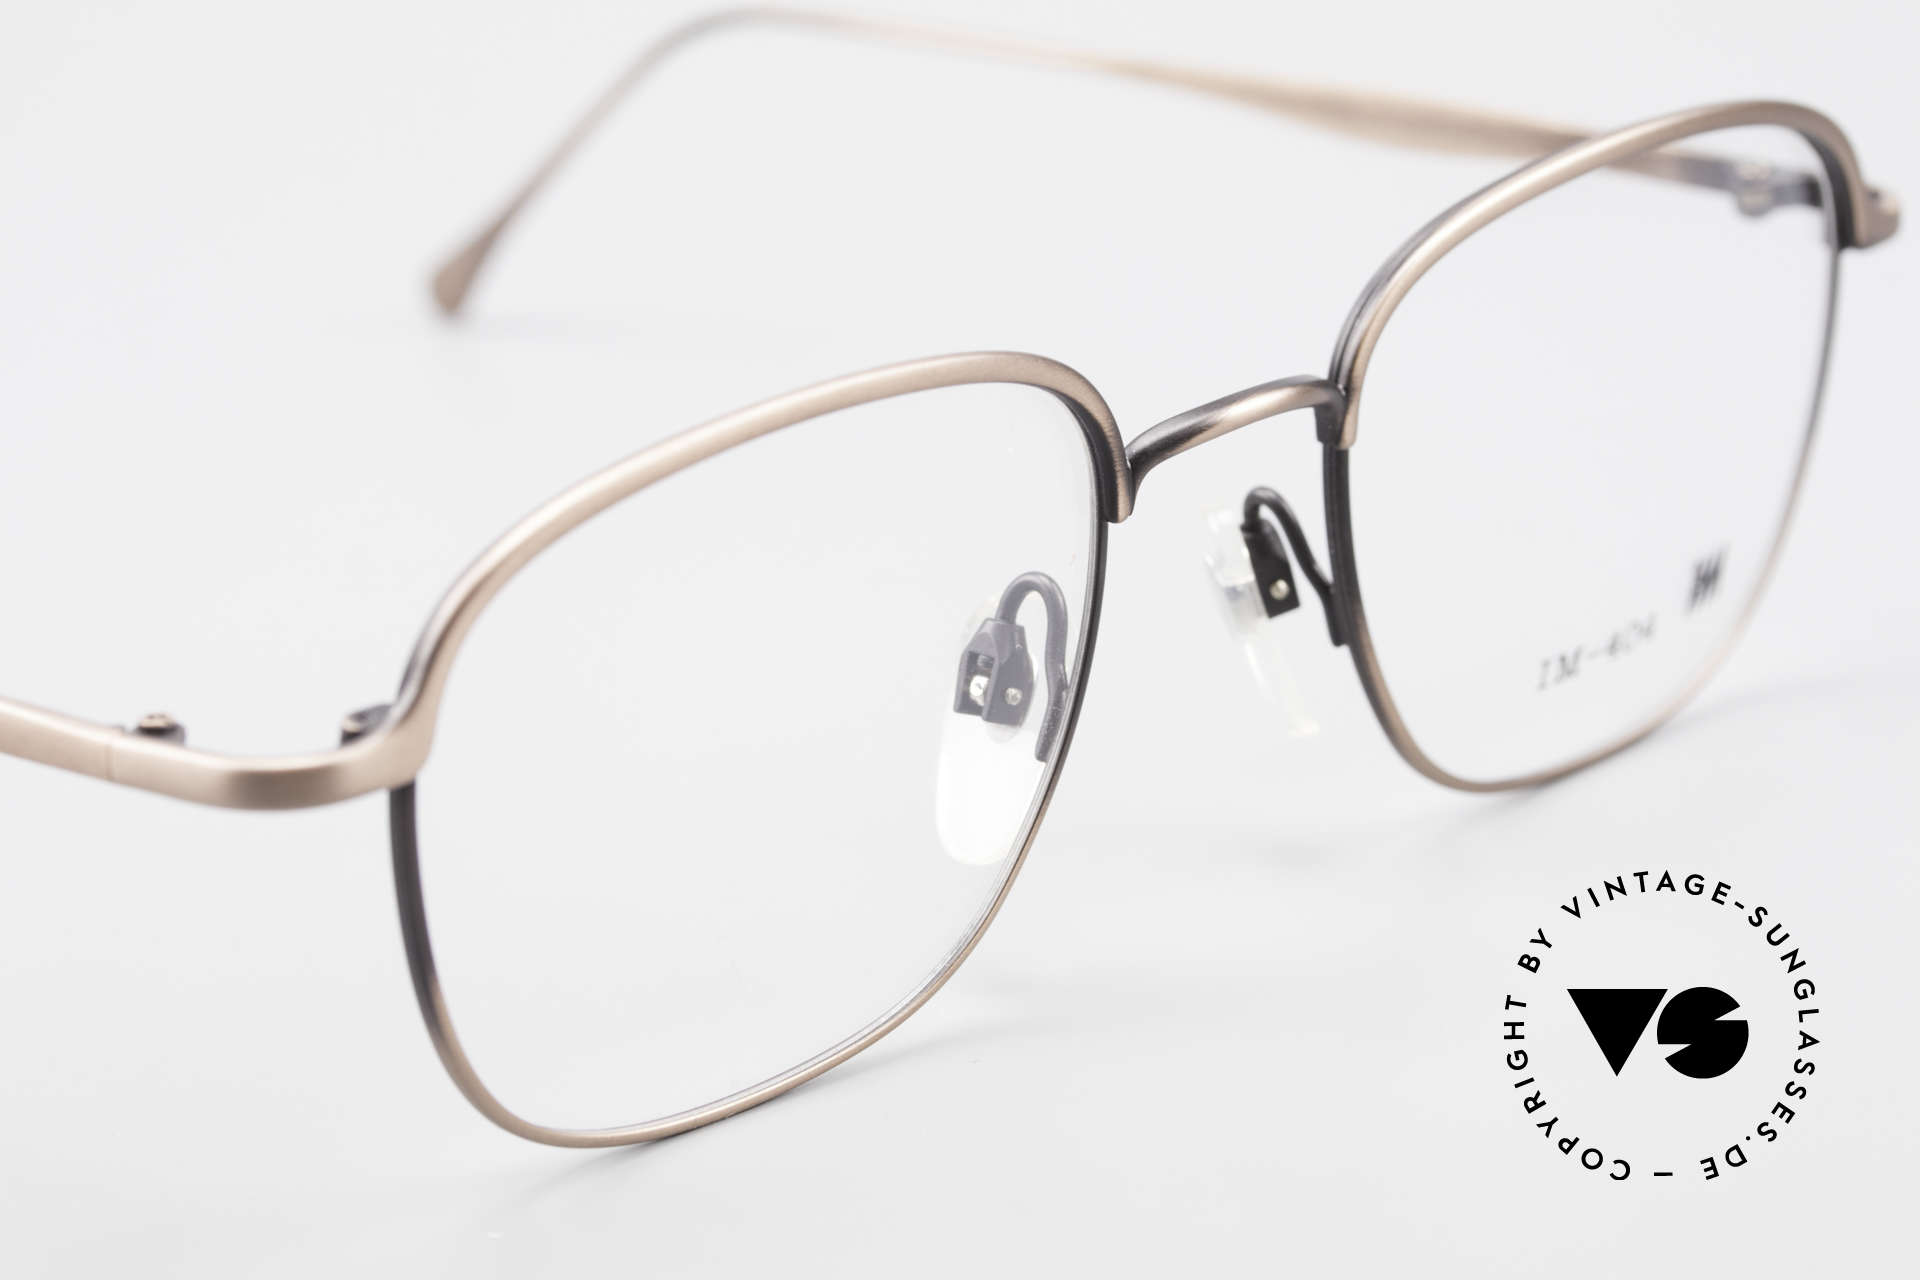 Miyake Design Studio IM404 Connoisseur Eyeglasses 90's, unworn 90's single item; NO RETRO eyeglasses!, Made for Men and Women